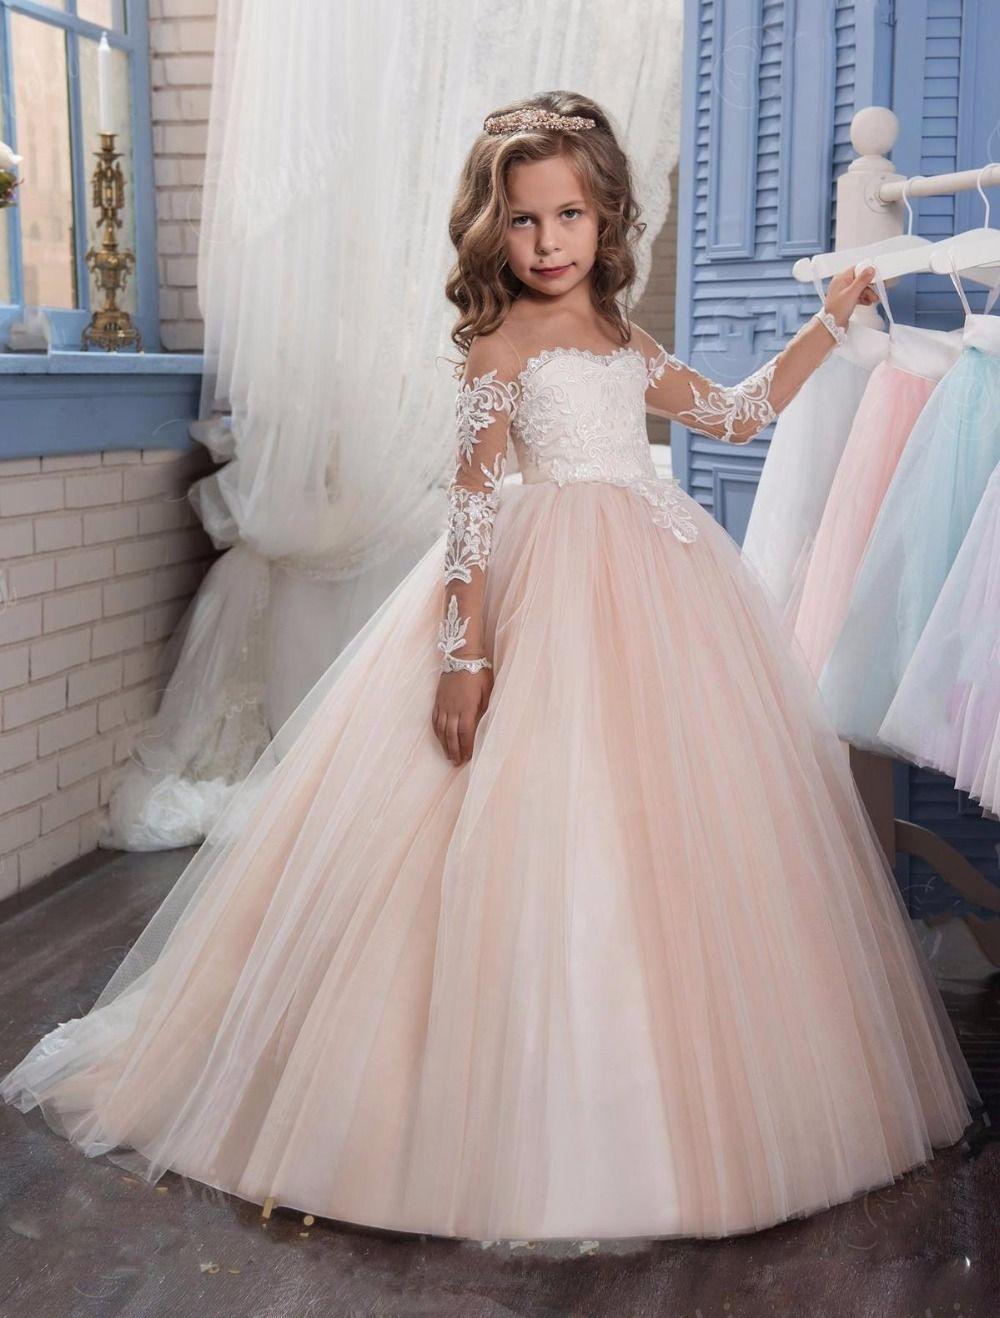 Romantic Champagne 2017 Puffy Flower Girl Dress for Weddings Organza ...